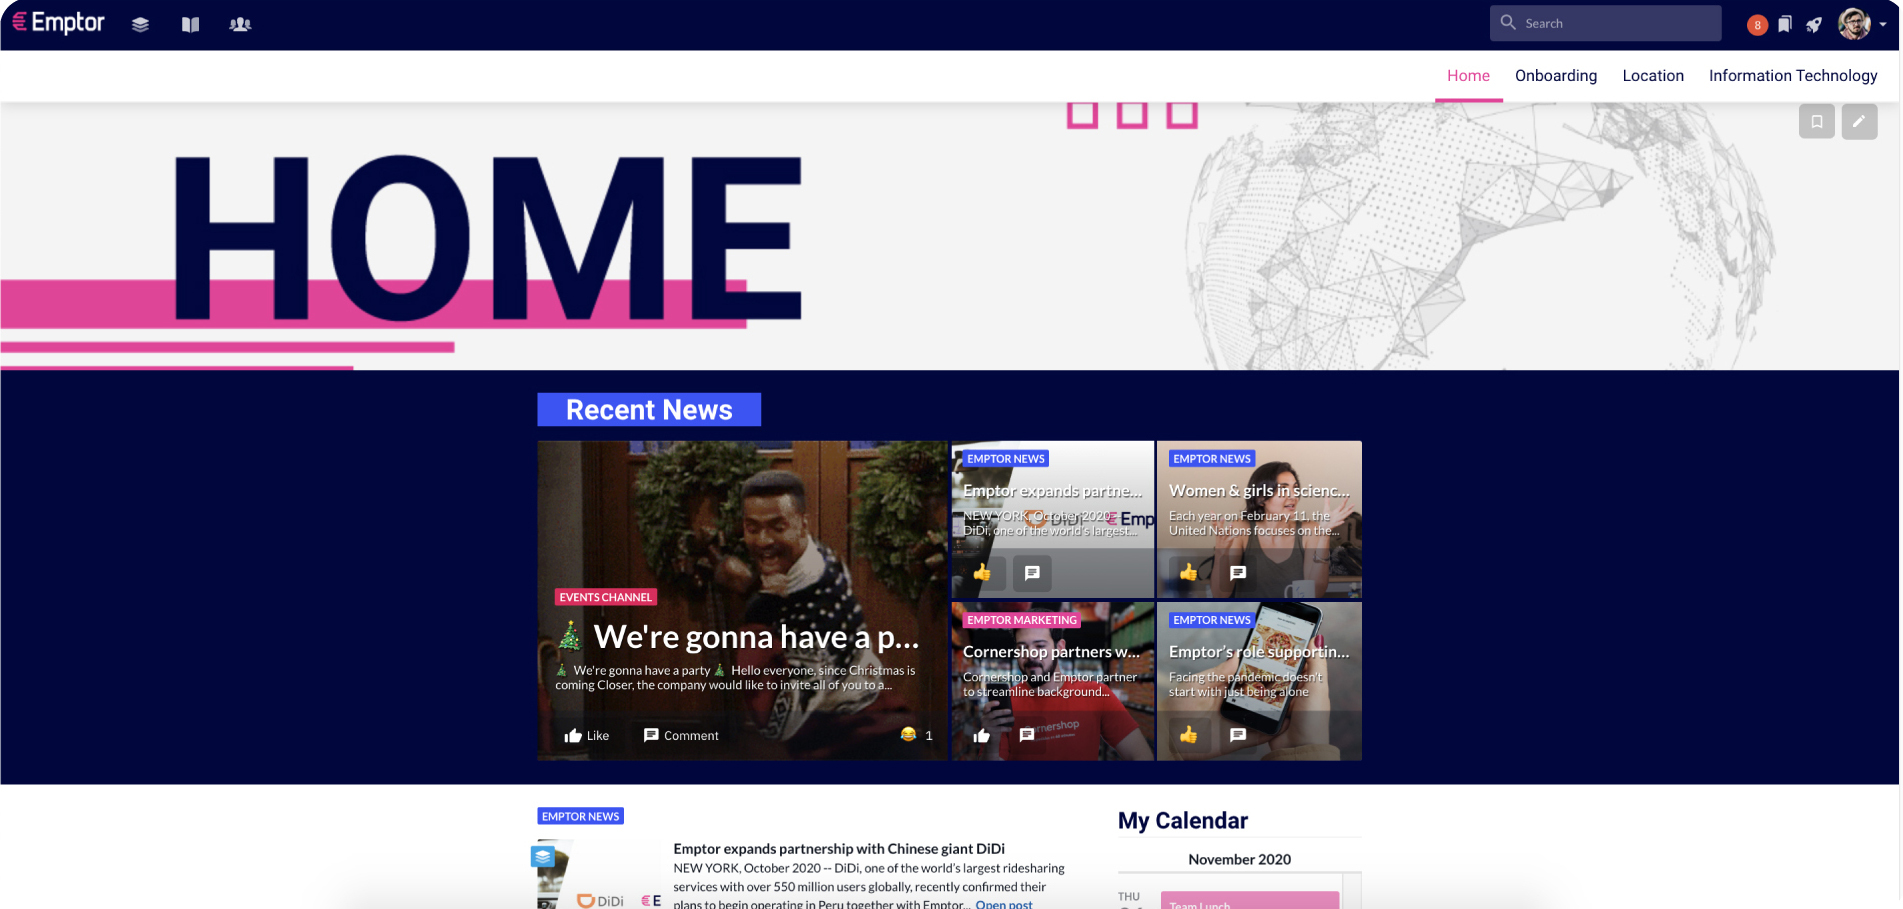 emptor-homepage copy-1